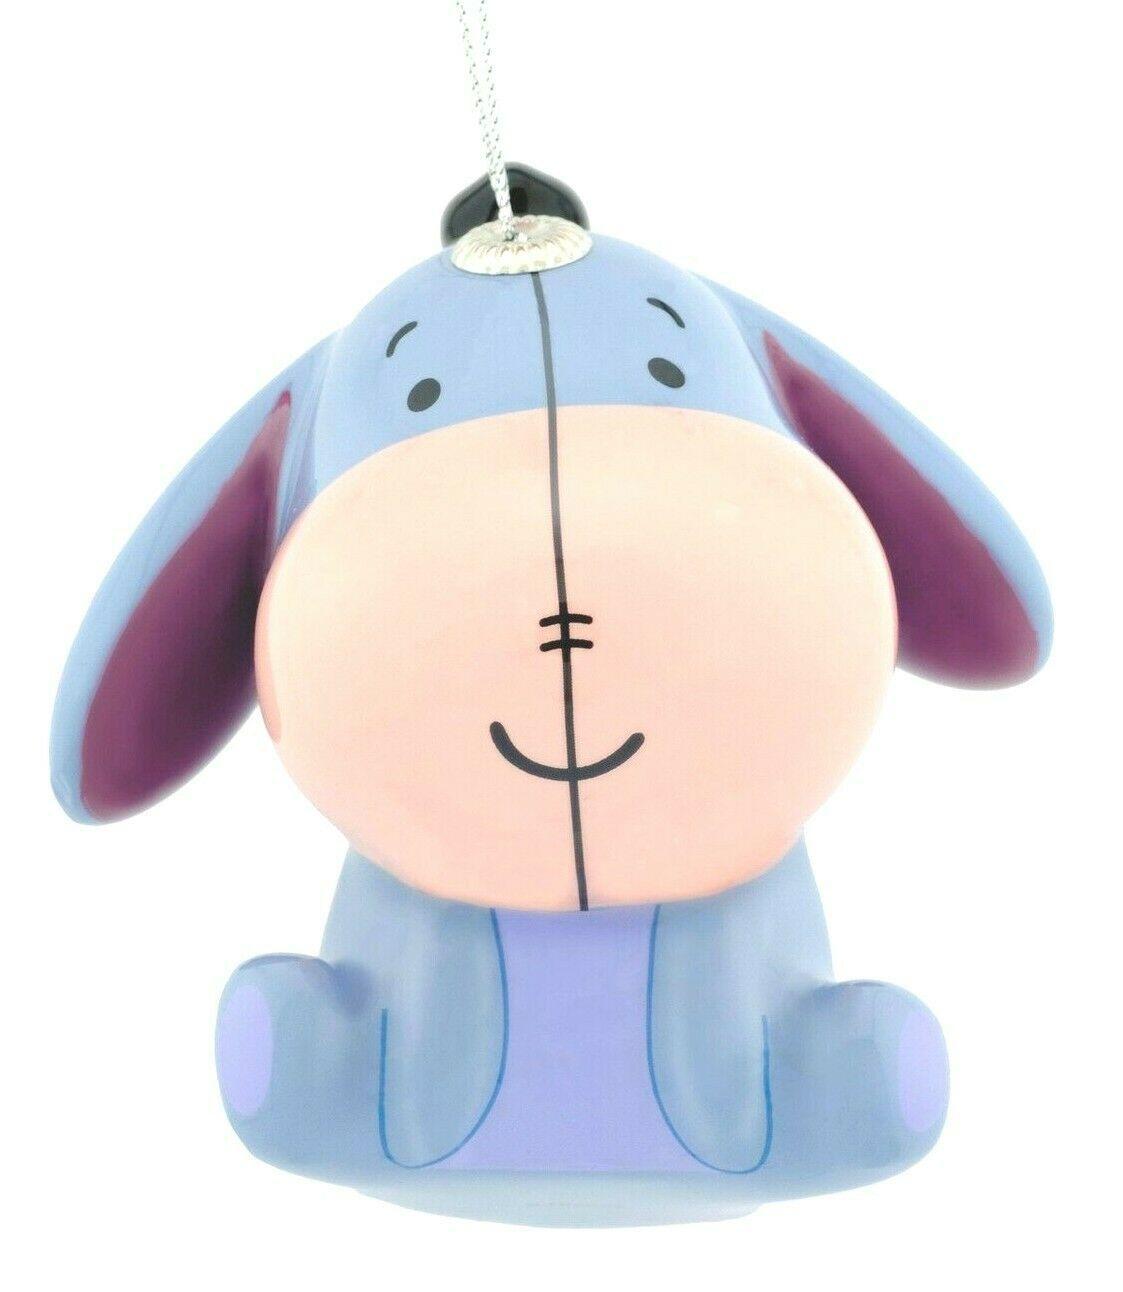 Hallmark Disney Winnie the Pooh Eeyore Decoupage Shatterproof Christmas Ornament